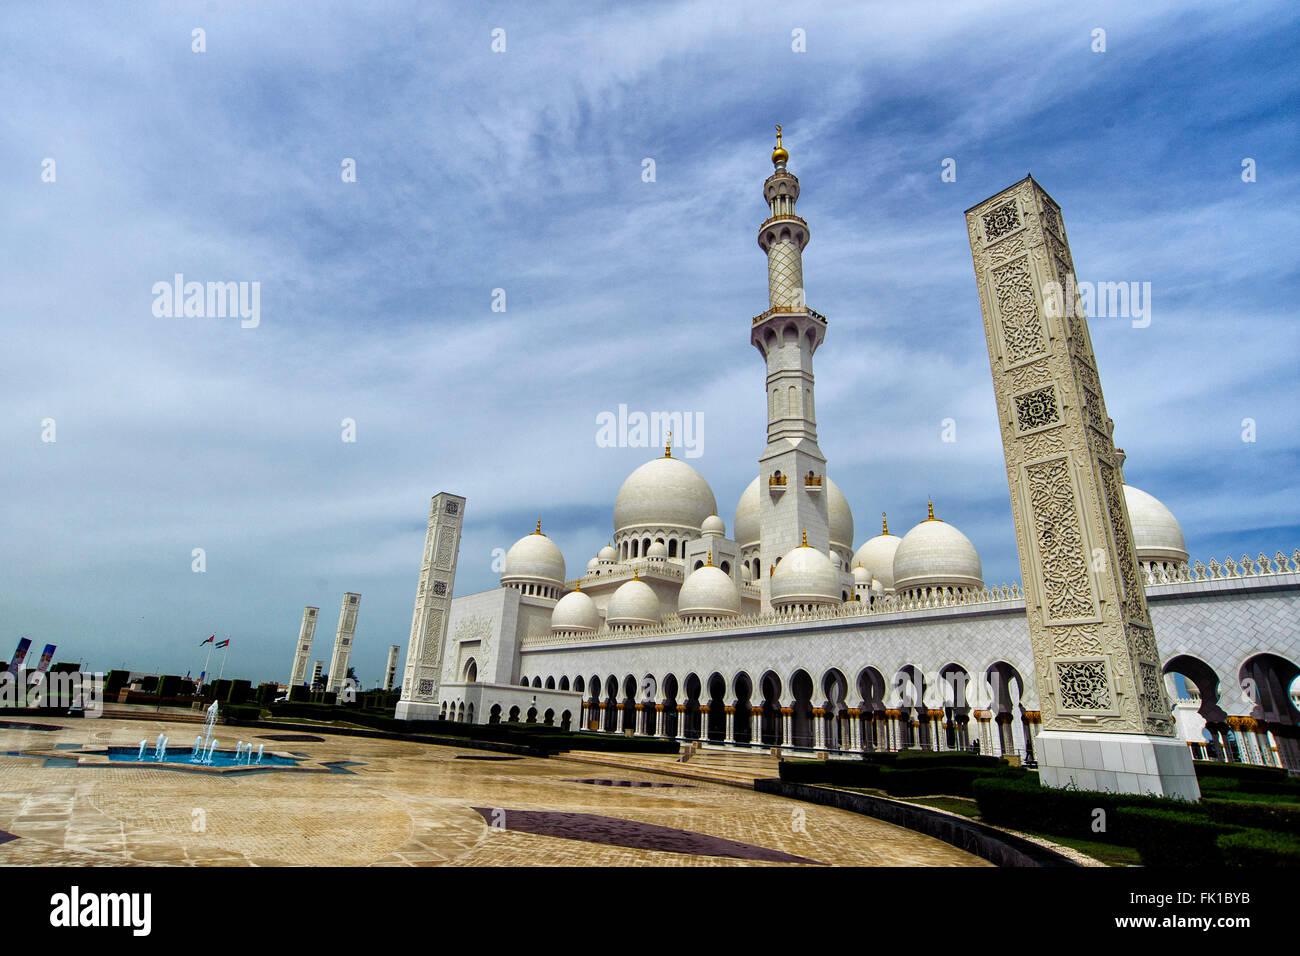 Sheikh Zayed Grande Moschea di Abu Dhabi 29-02-2016 EMIRATI ARABI UNITI Foto Andrea Staccioli Insidefoto Immagini Stock